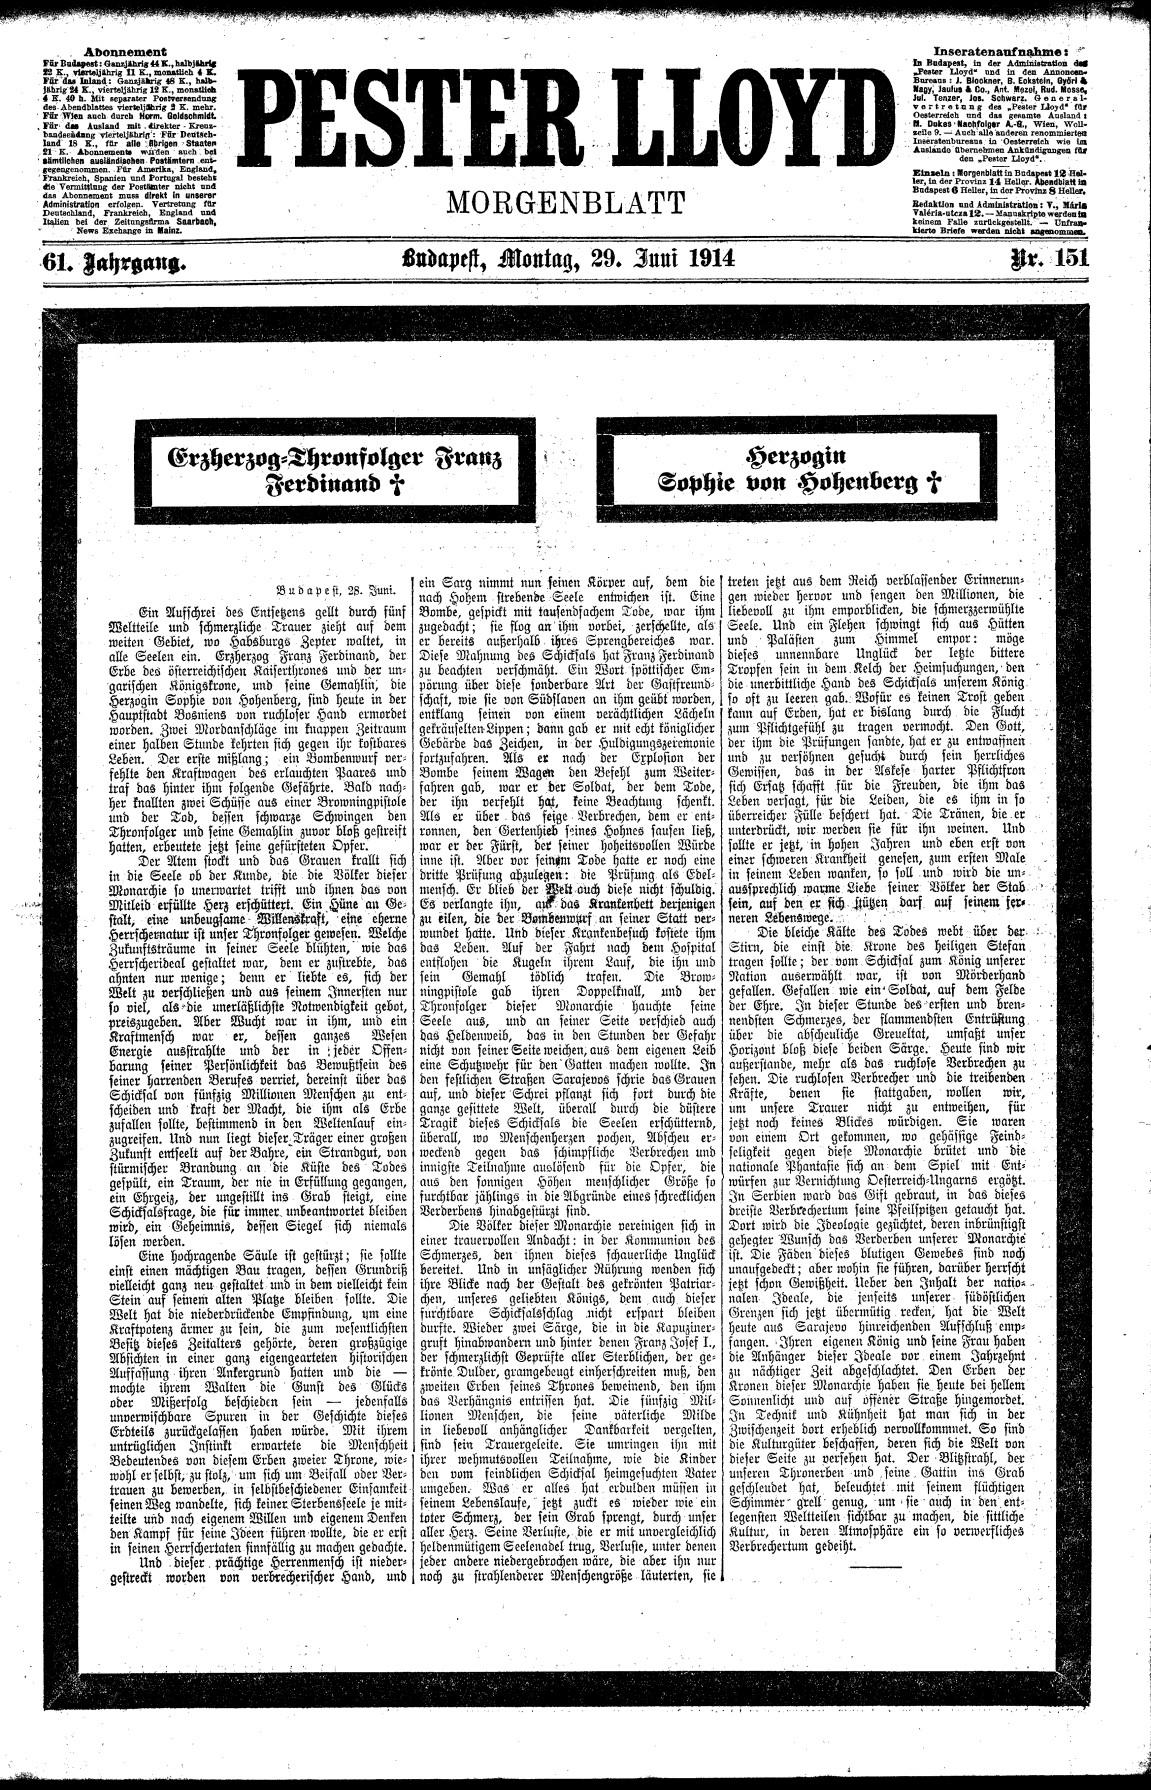 The Pester Lloyd reporting on the death of Archduke Franz Ferdinand and Archduchess Sophie in Sarajevo. ANNO/Österreichische Nationalbibliothek